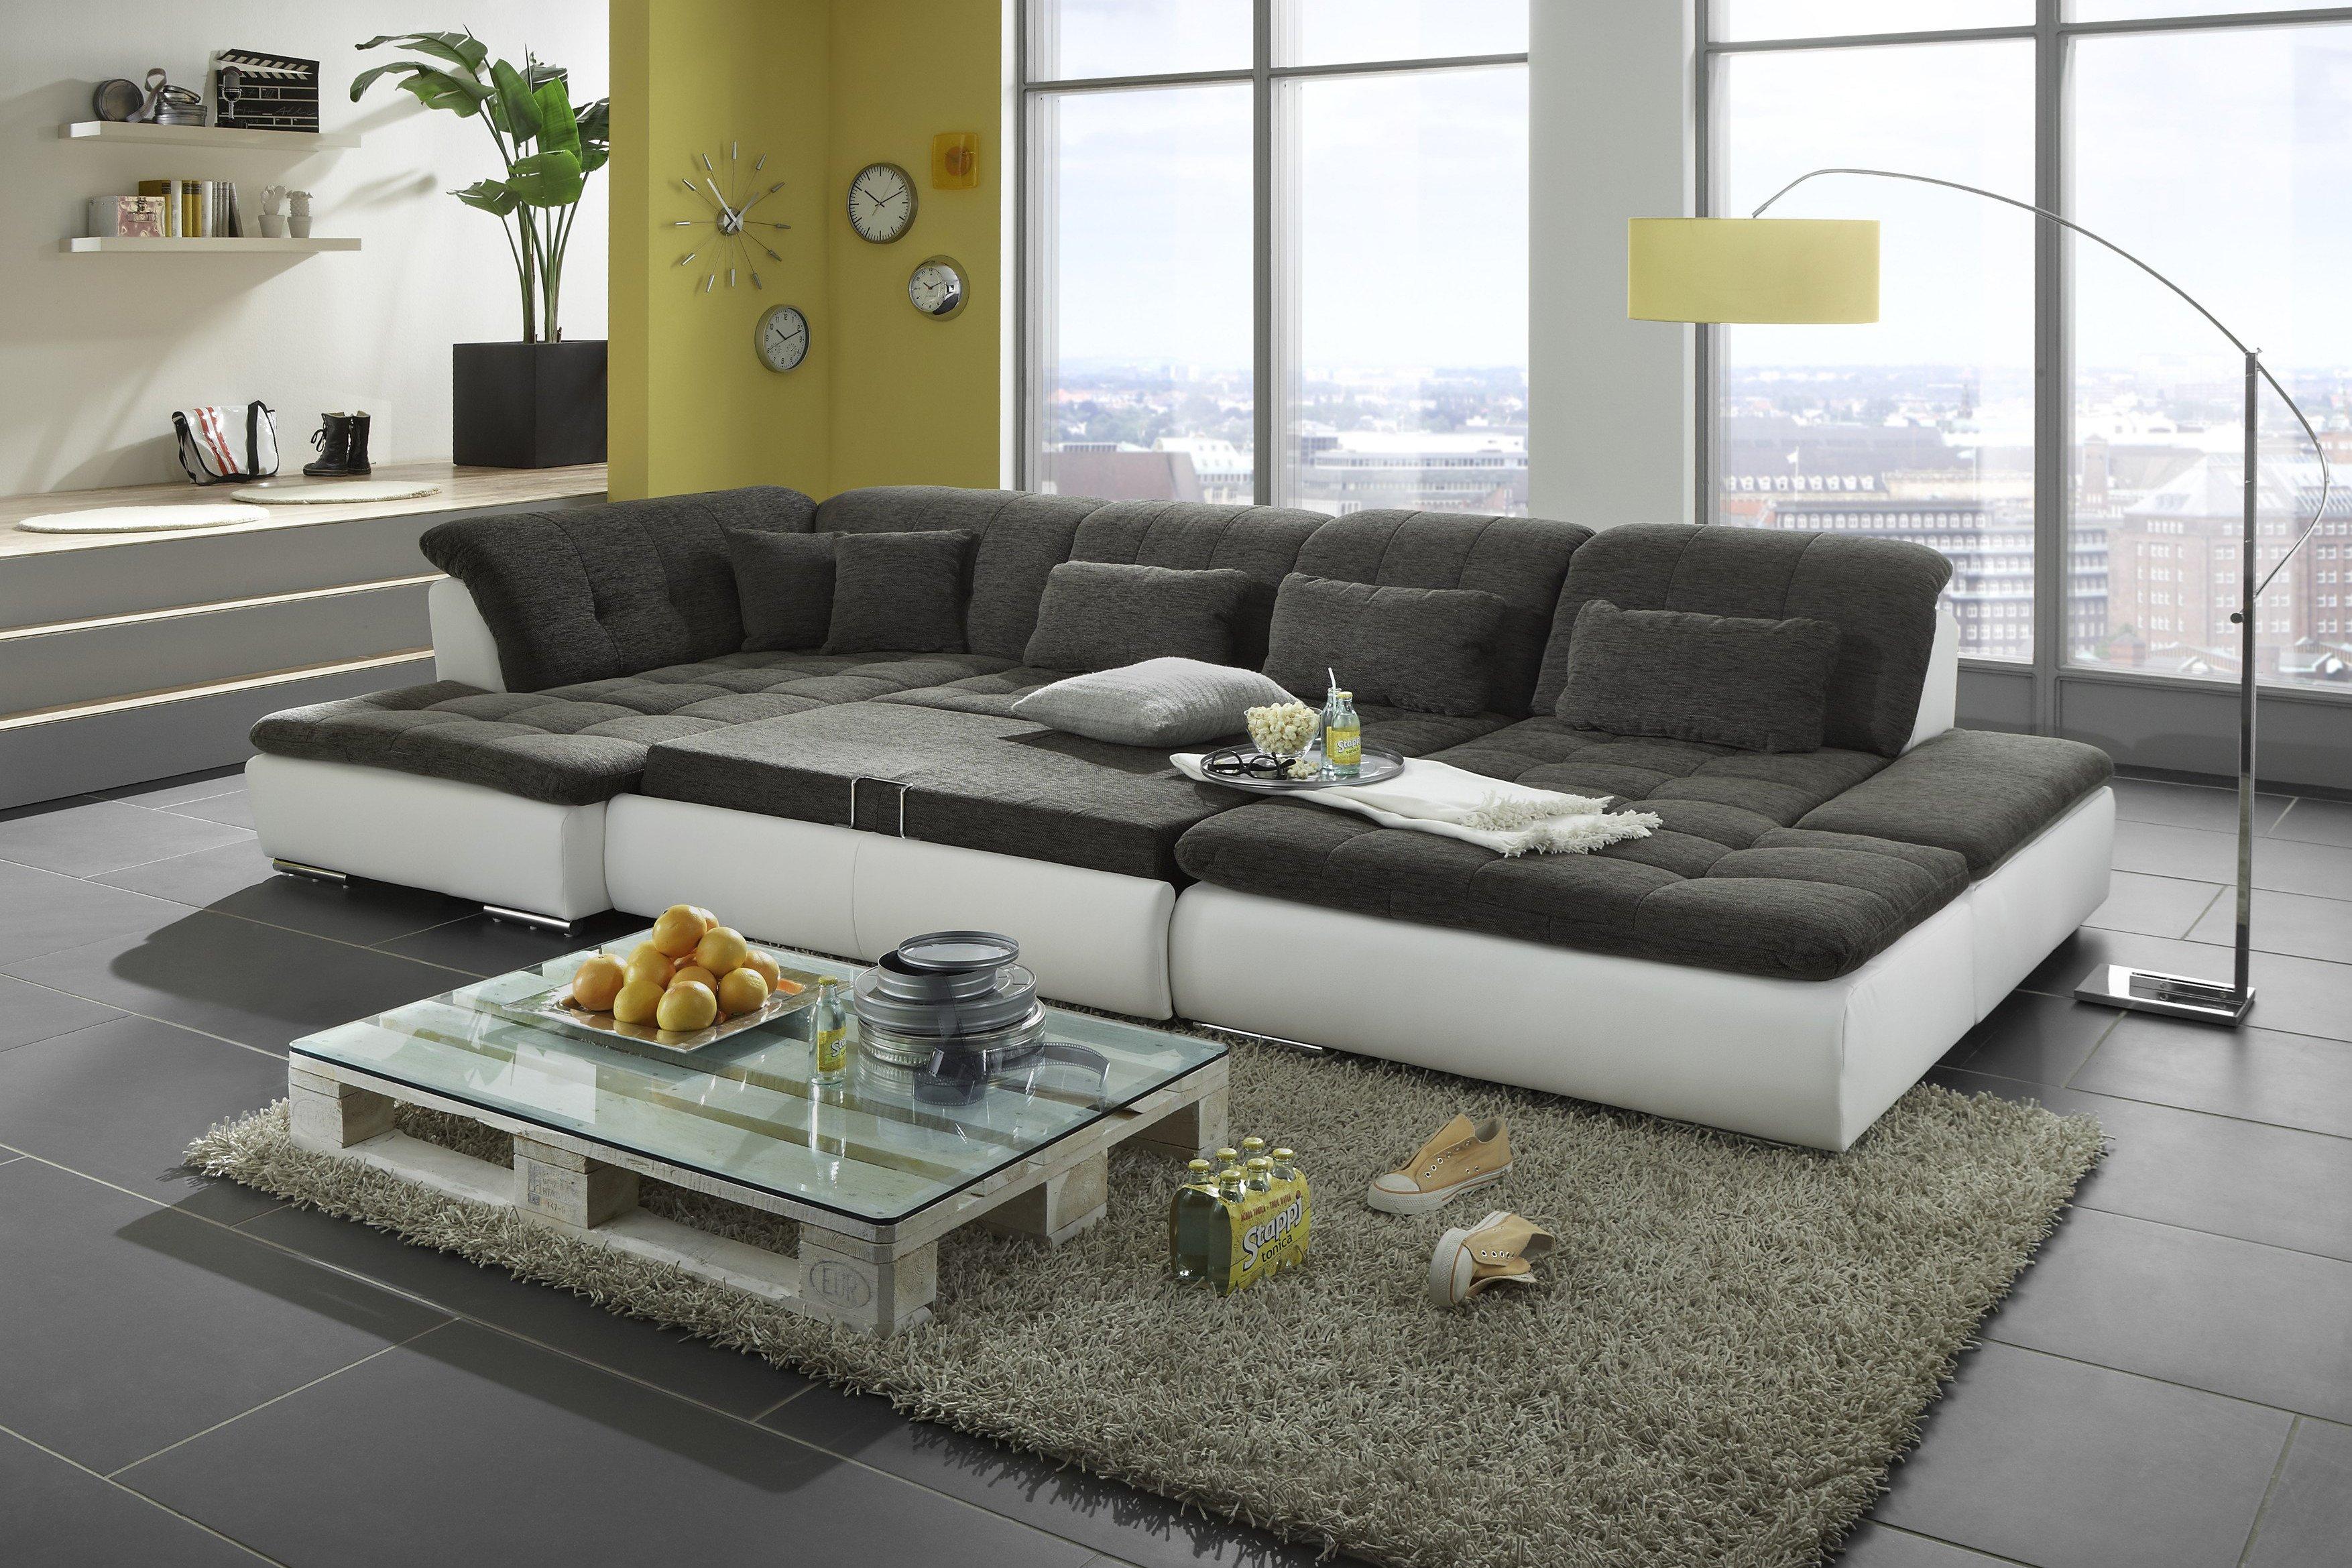 megapol couchgarnitur lomo wei grau m bel letz ihr. Black Bedroom Furniture Sets. Home Design Ideas